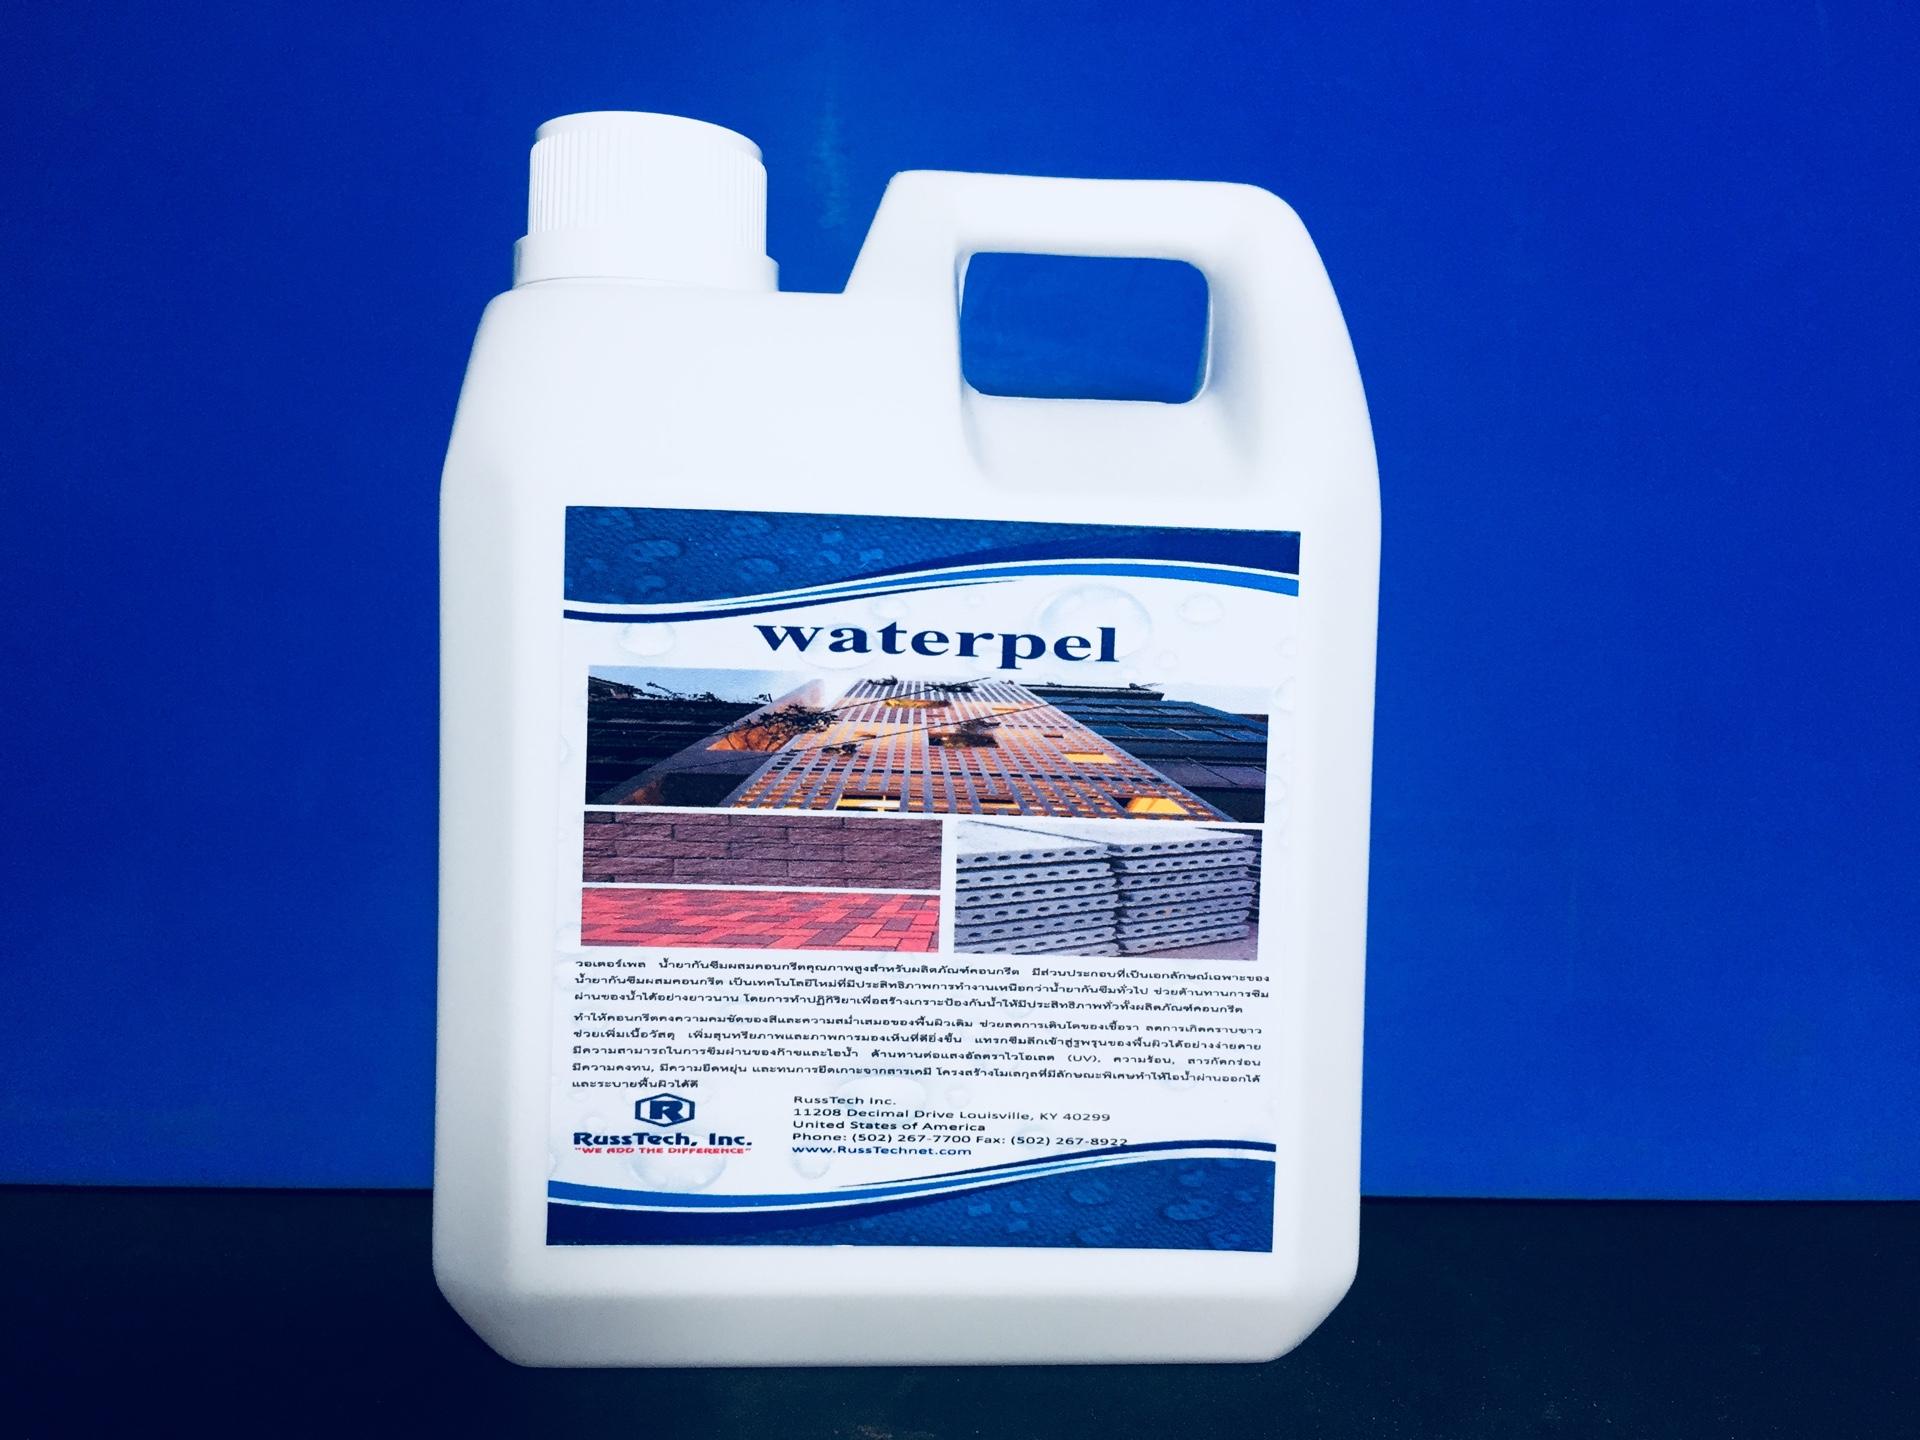 Waterpel น้ำยาผสมคอนกรีตกันซึม ประเภท Water Repellent 1 ลิตร